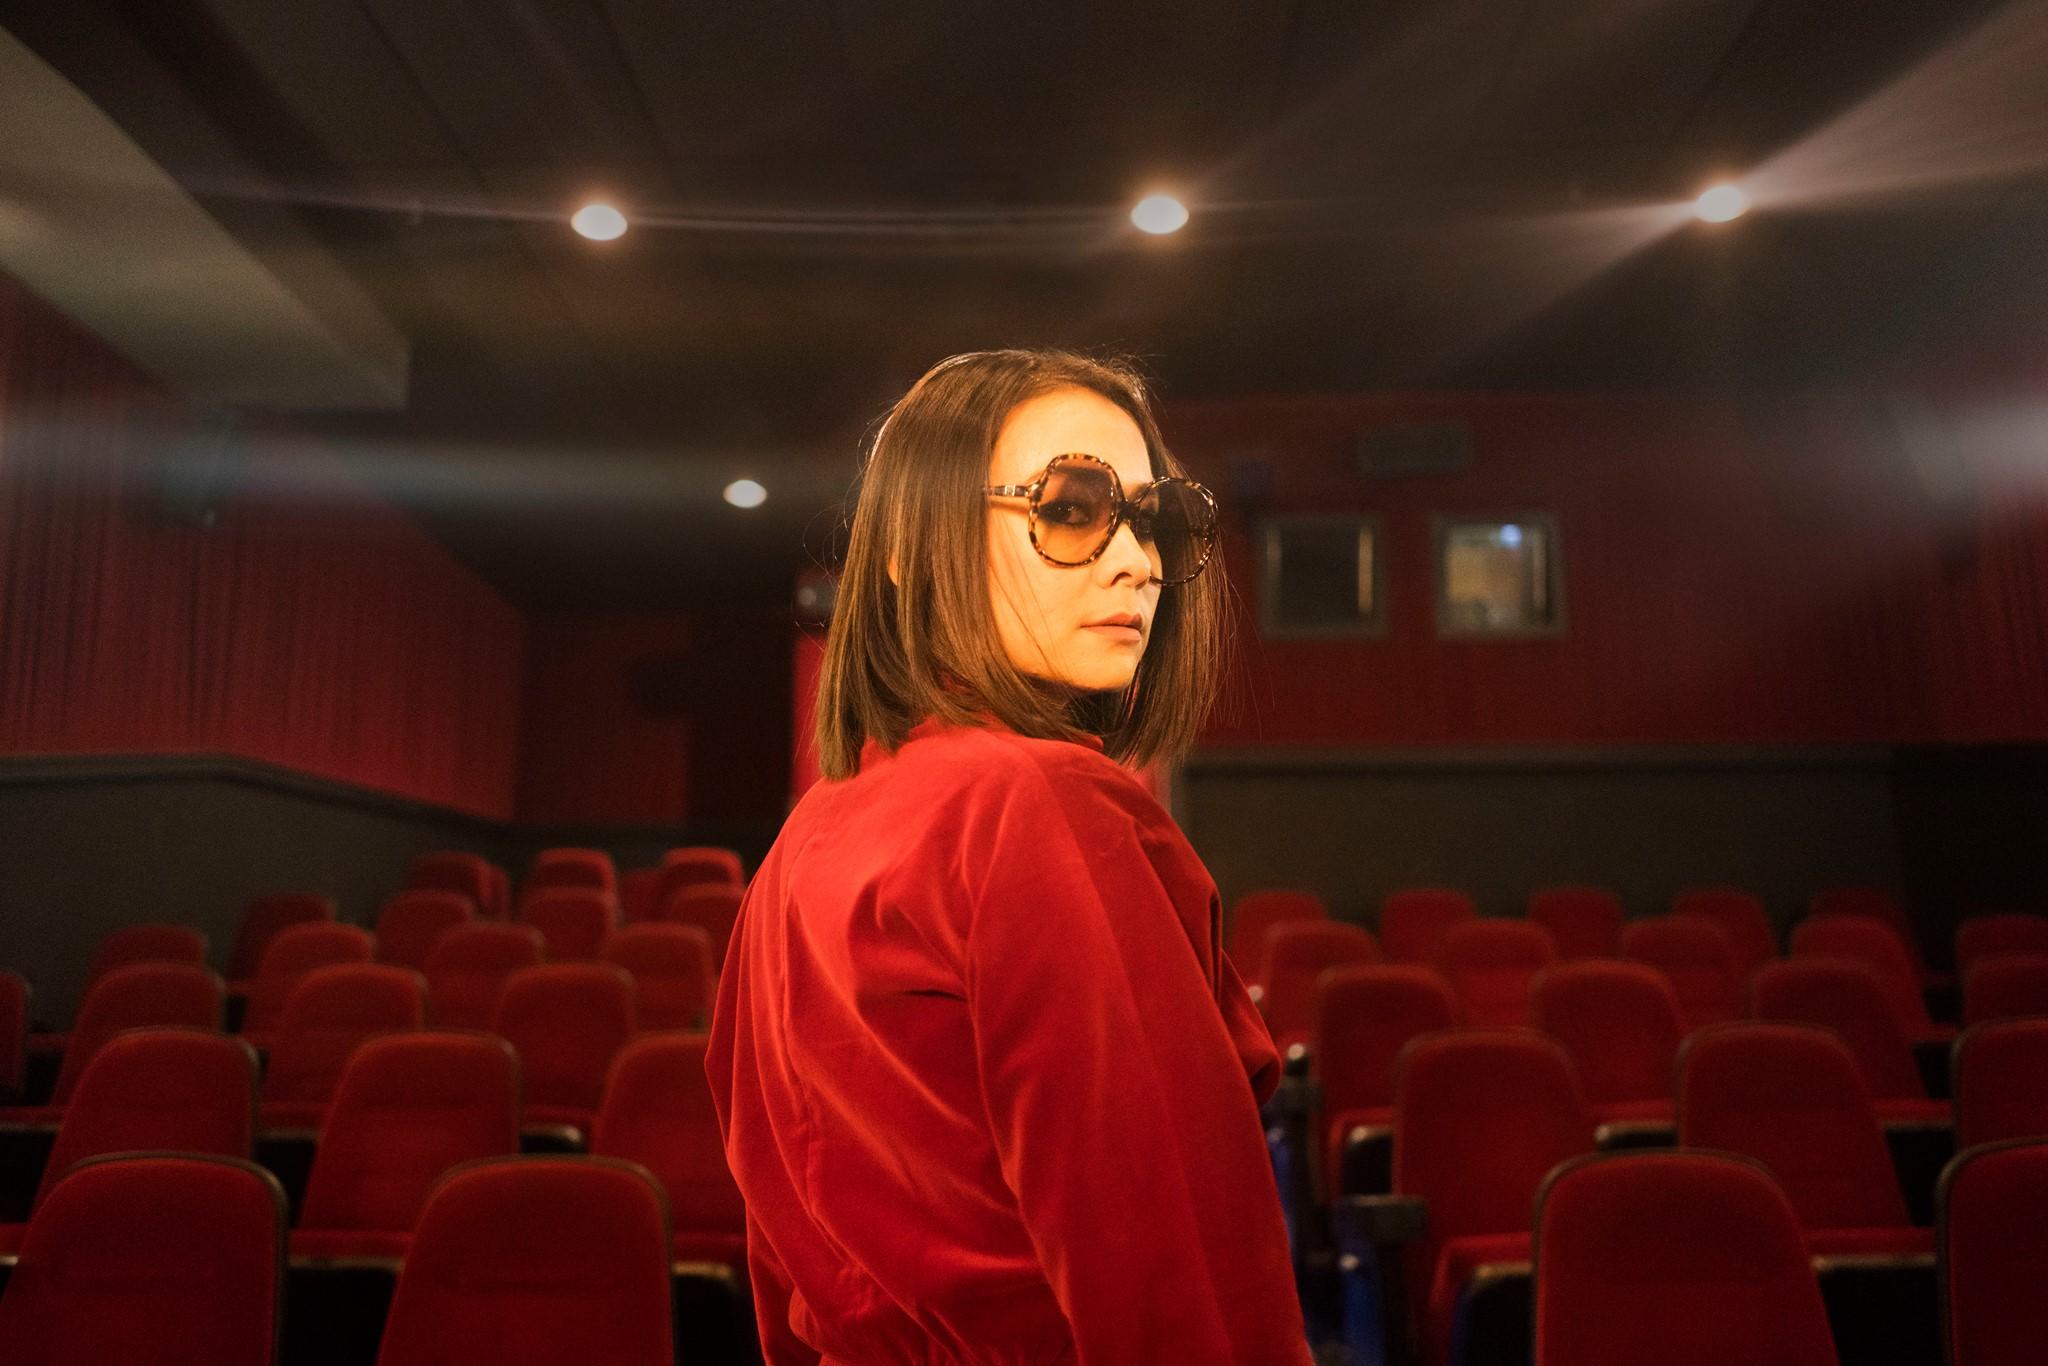 mitski upcoming concerts in singapore in 2019